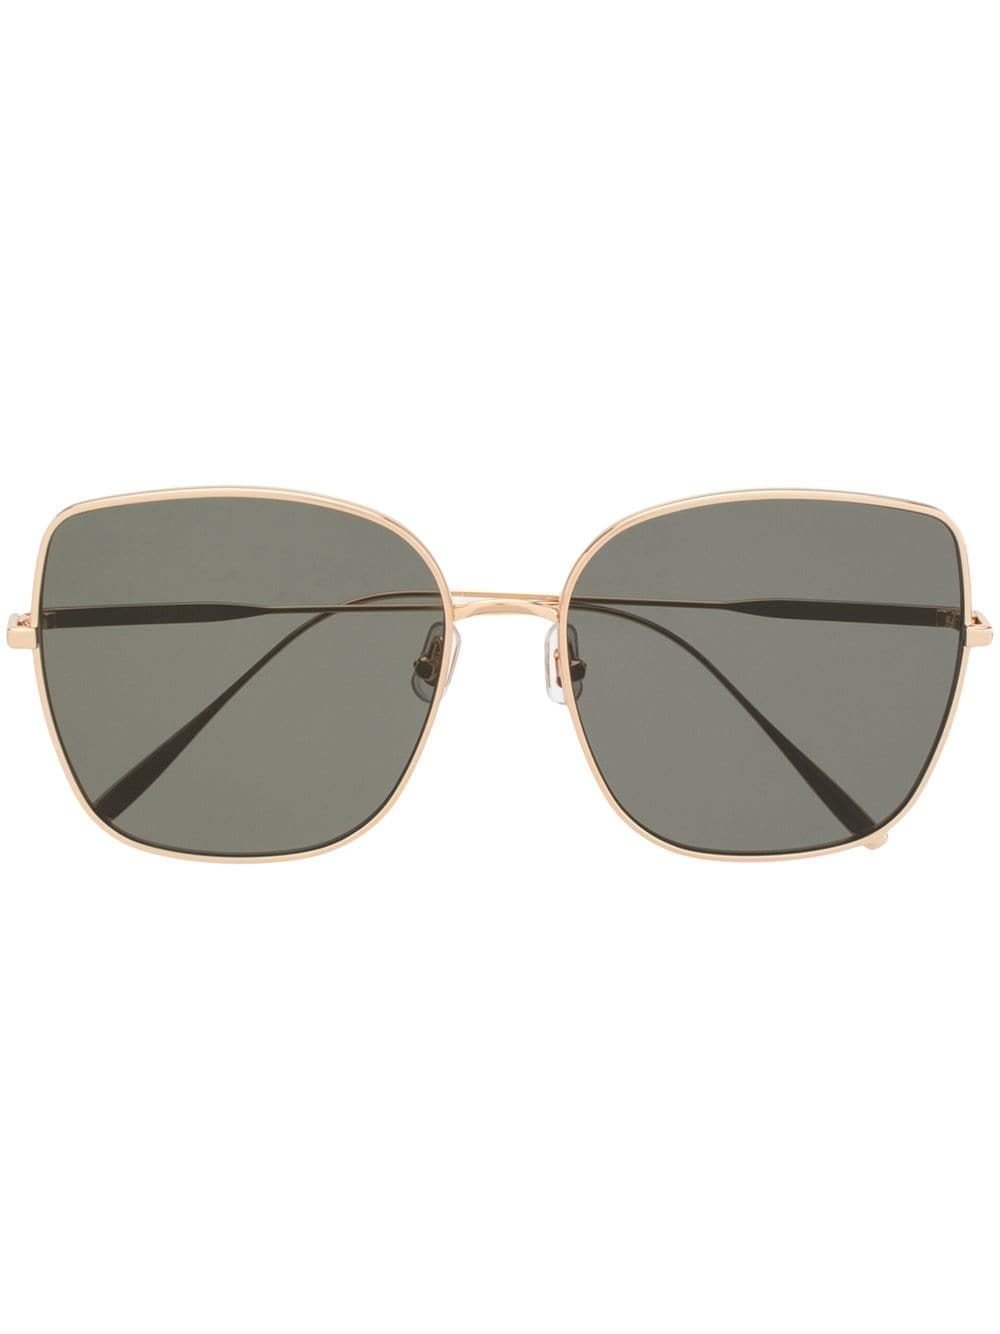 Gentle Monster Bling 032 Sunglasses – Farfetch